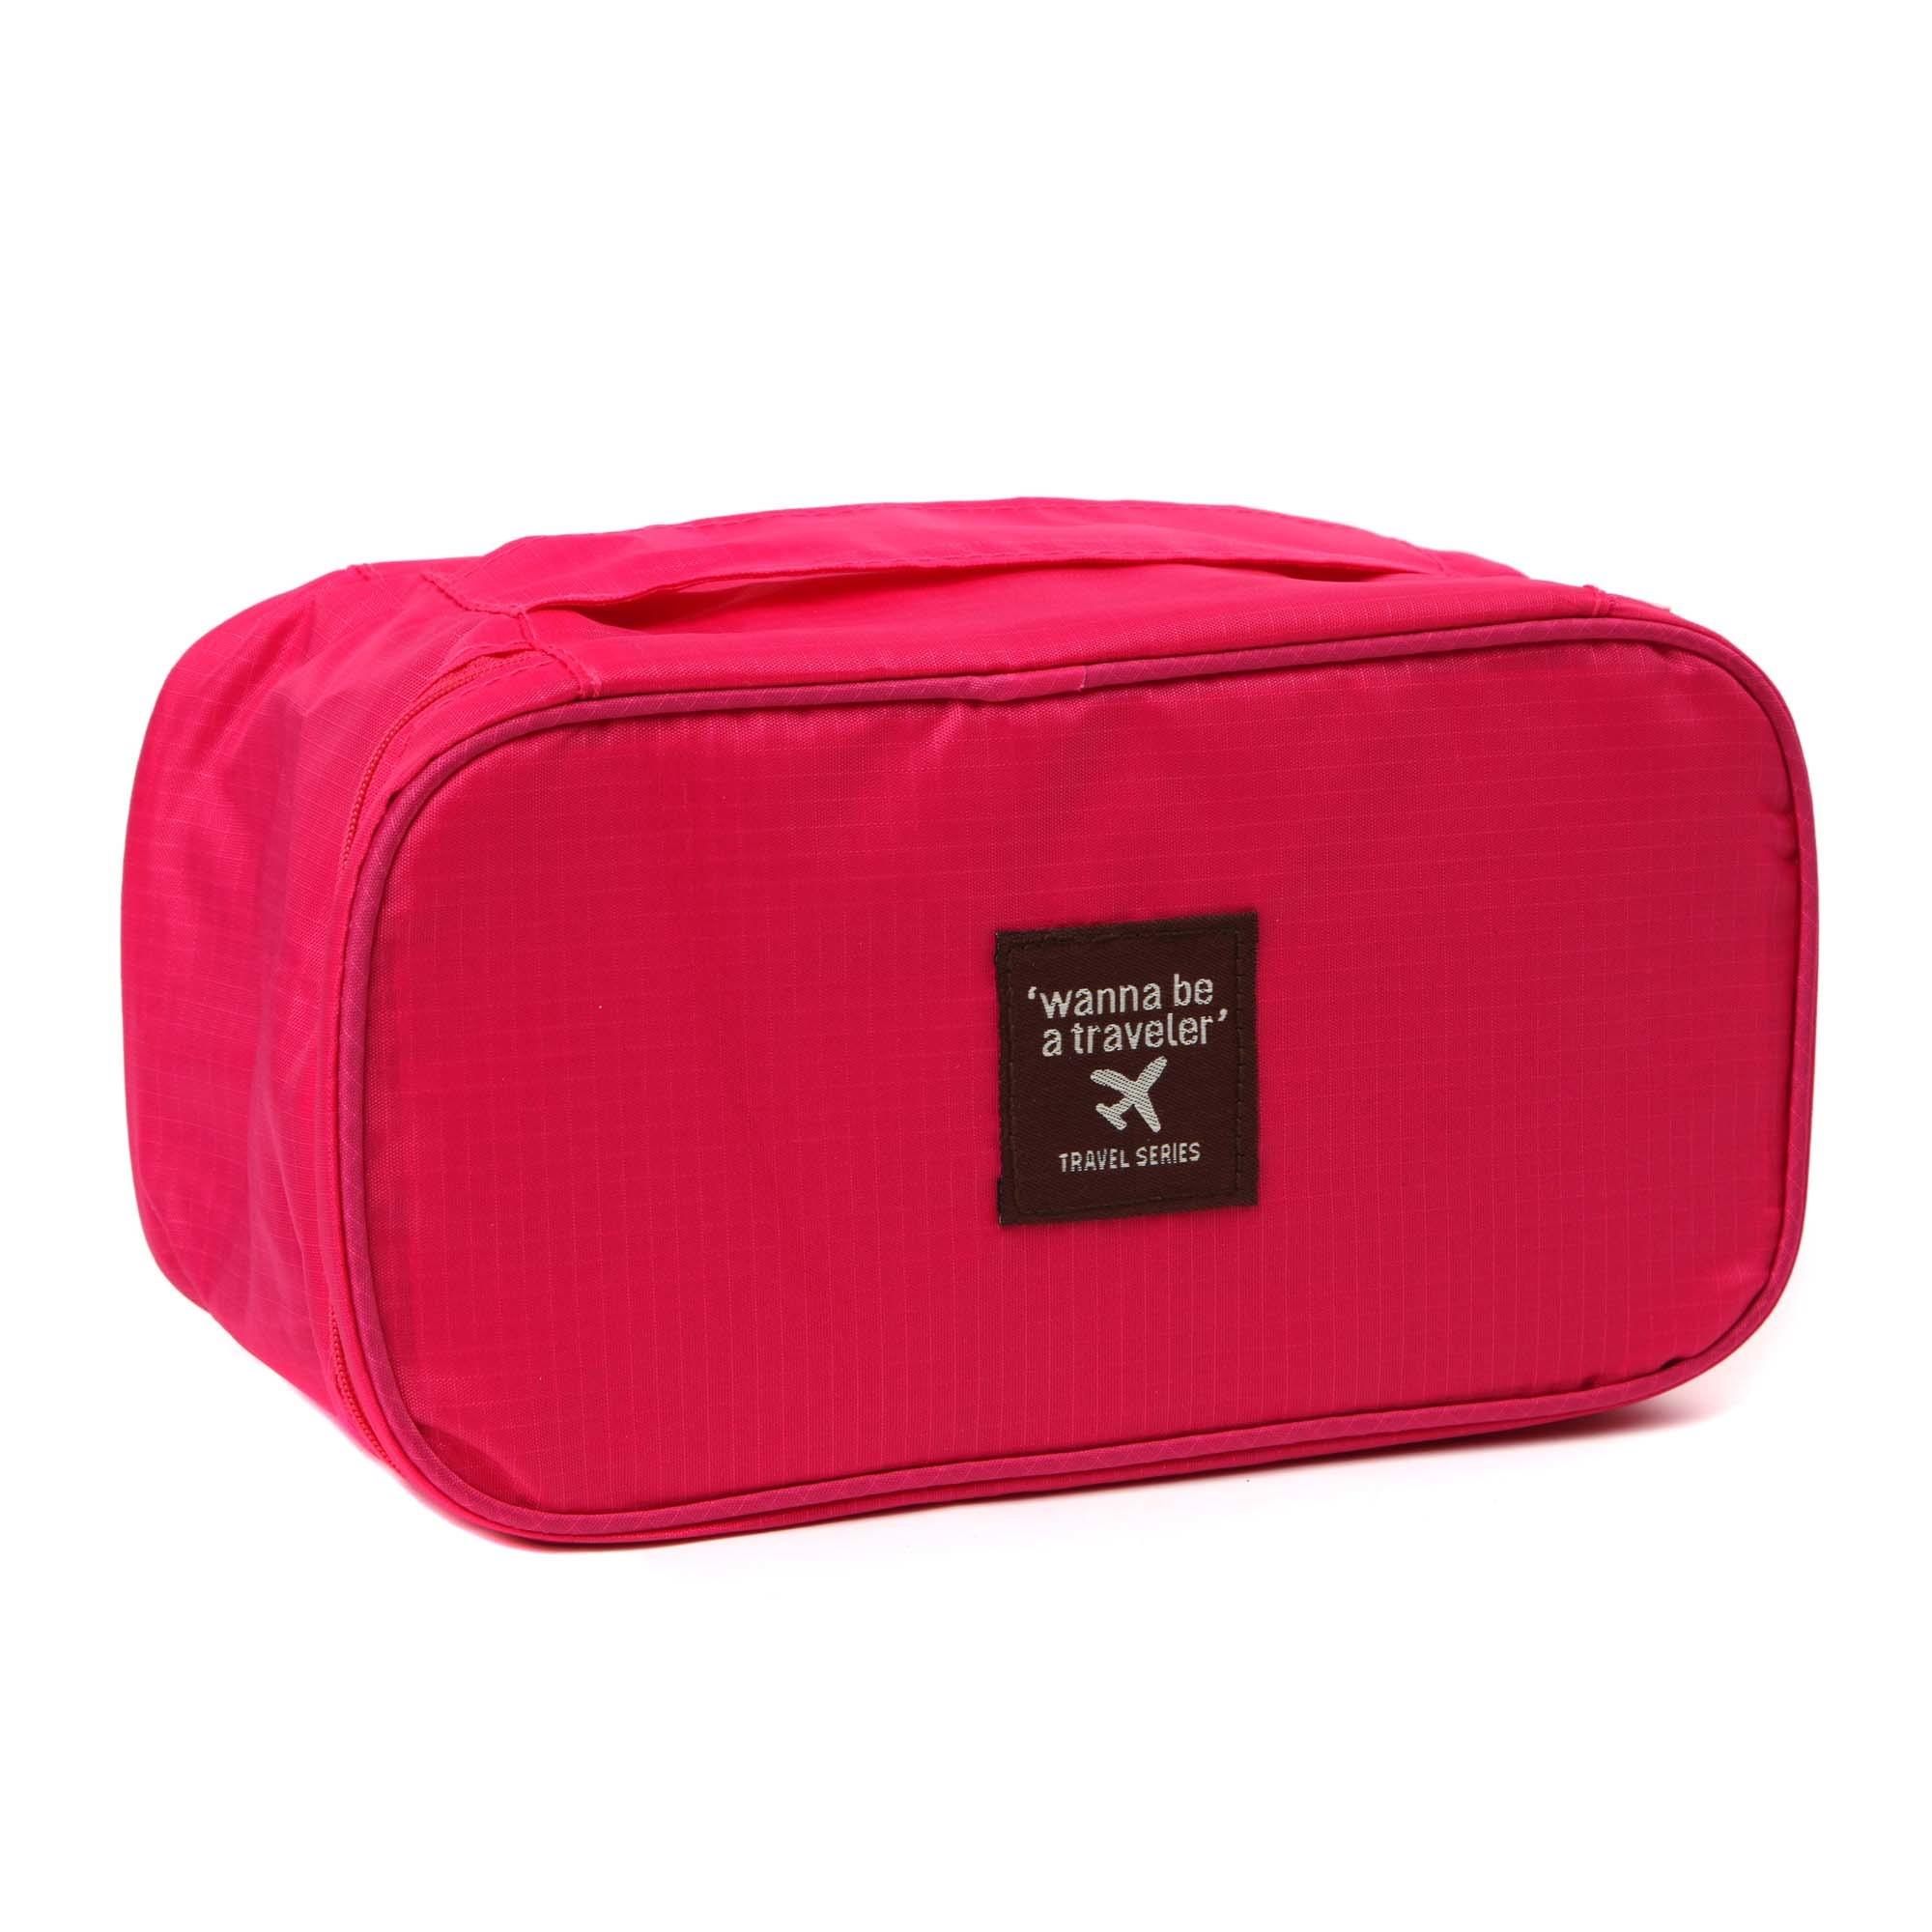 Storage Bag for Travel, Leisure Bag